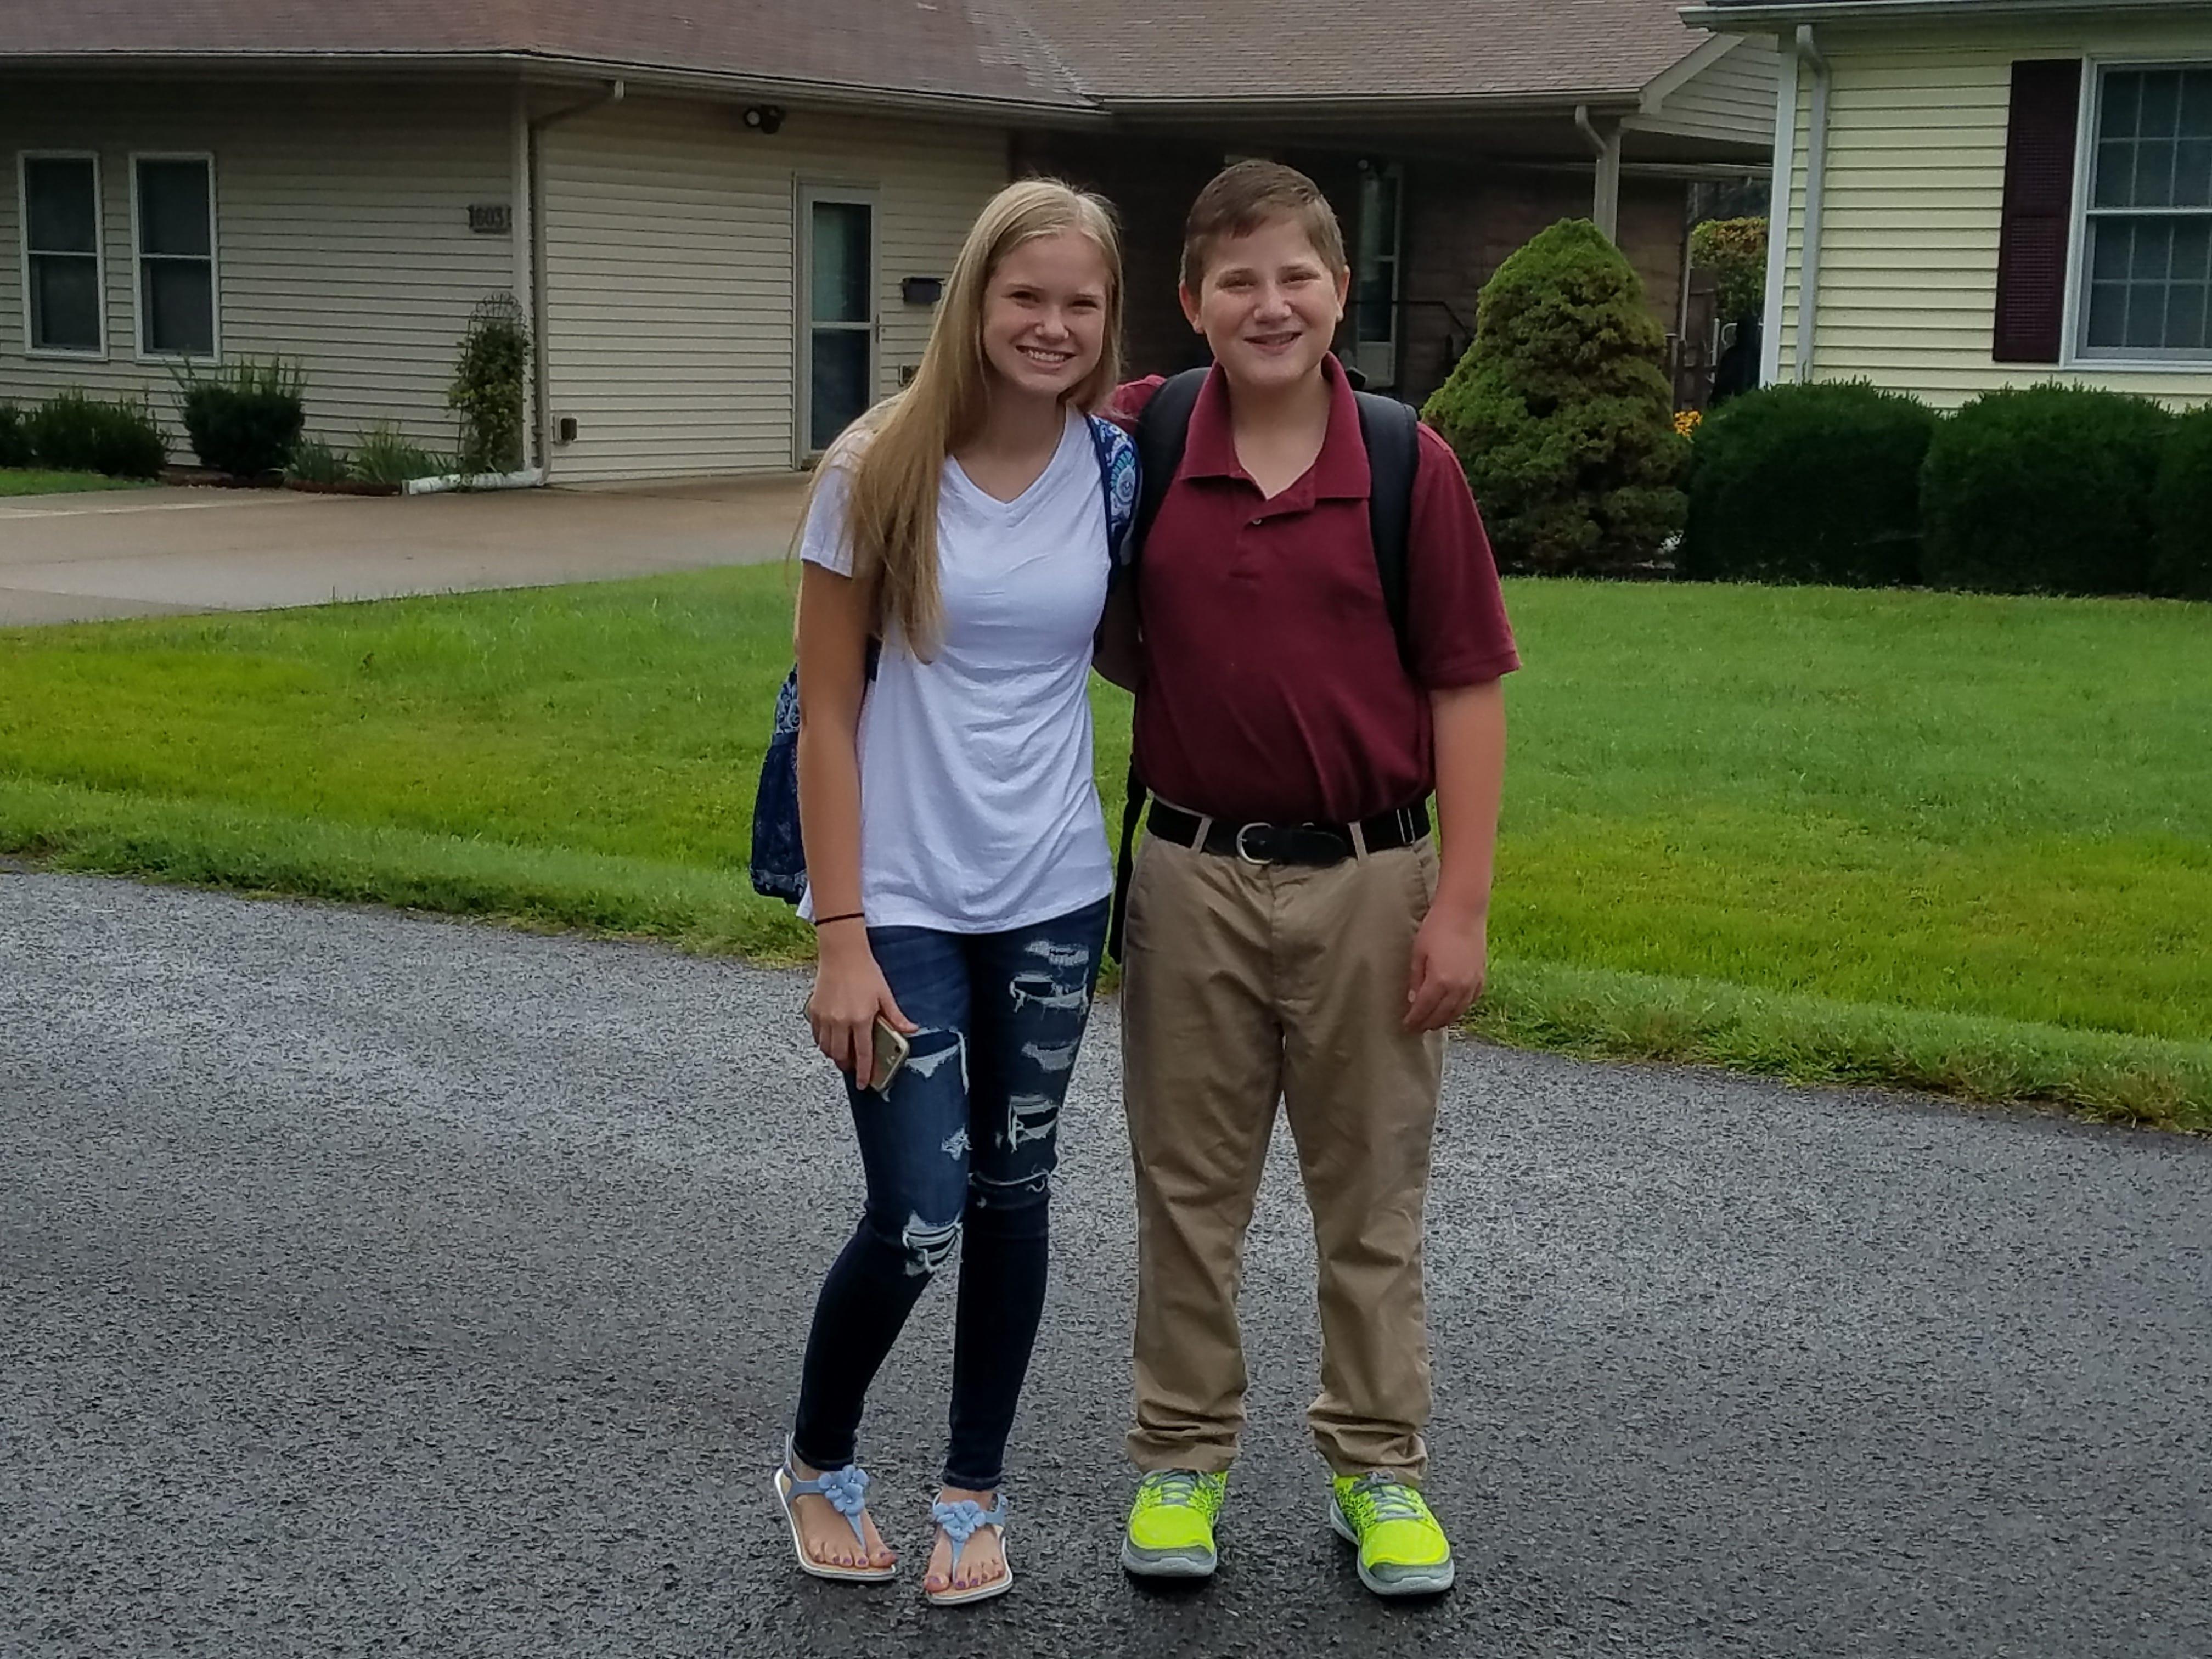 Breezie Trodglen - freshman, Leighton Trodglen - 8th grade